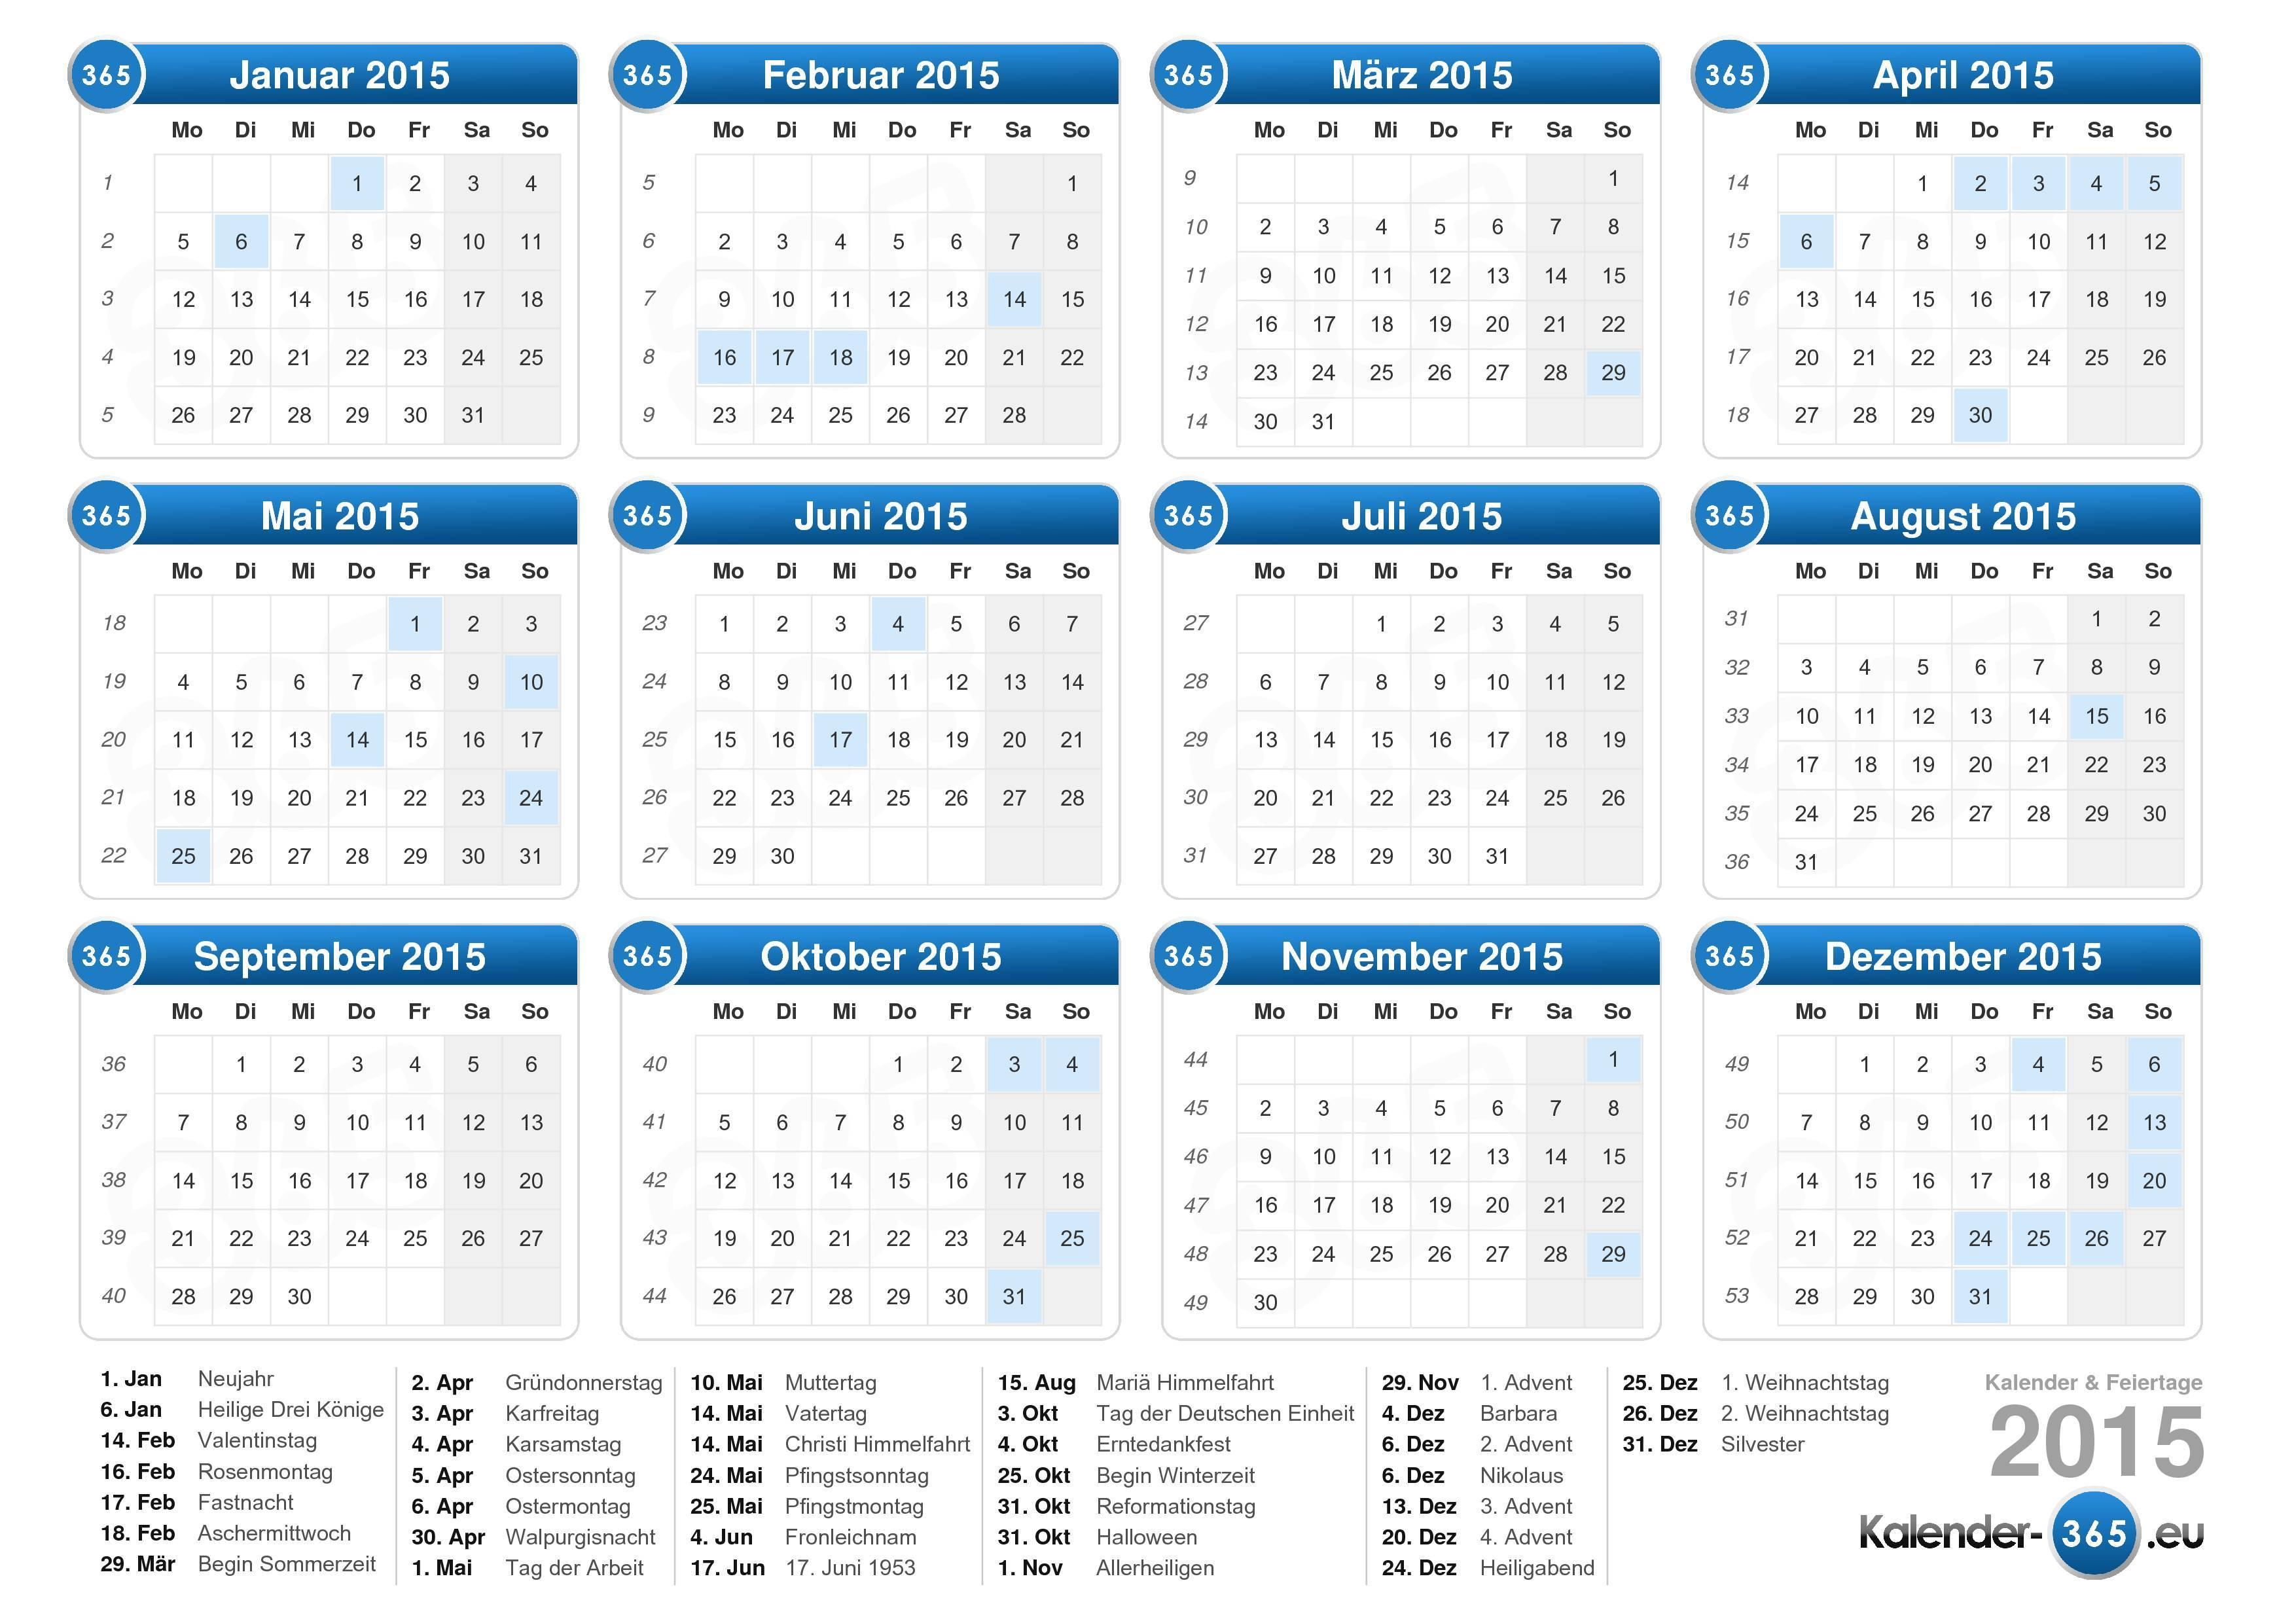 Kalender 2015 Images - Card Design And Card Template